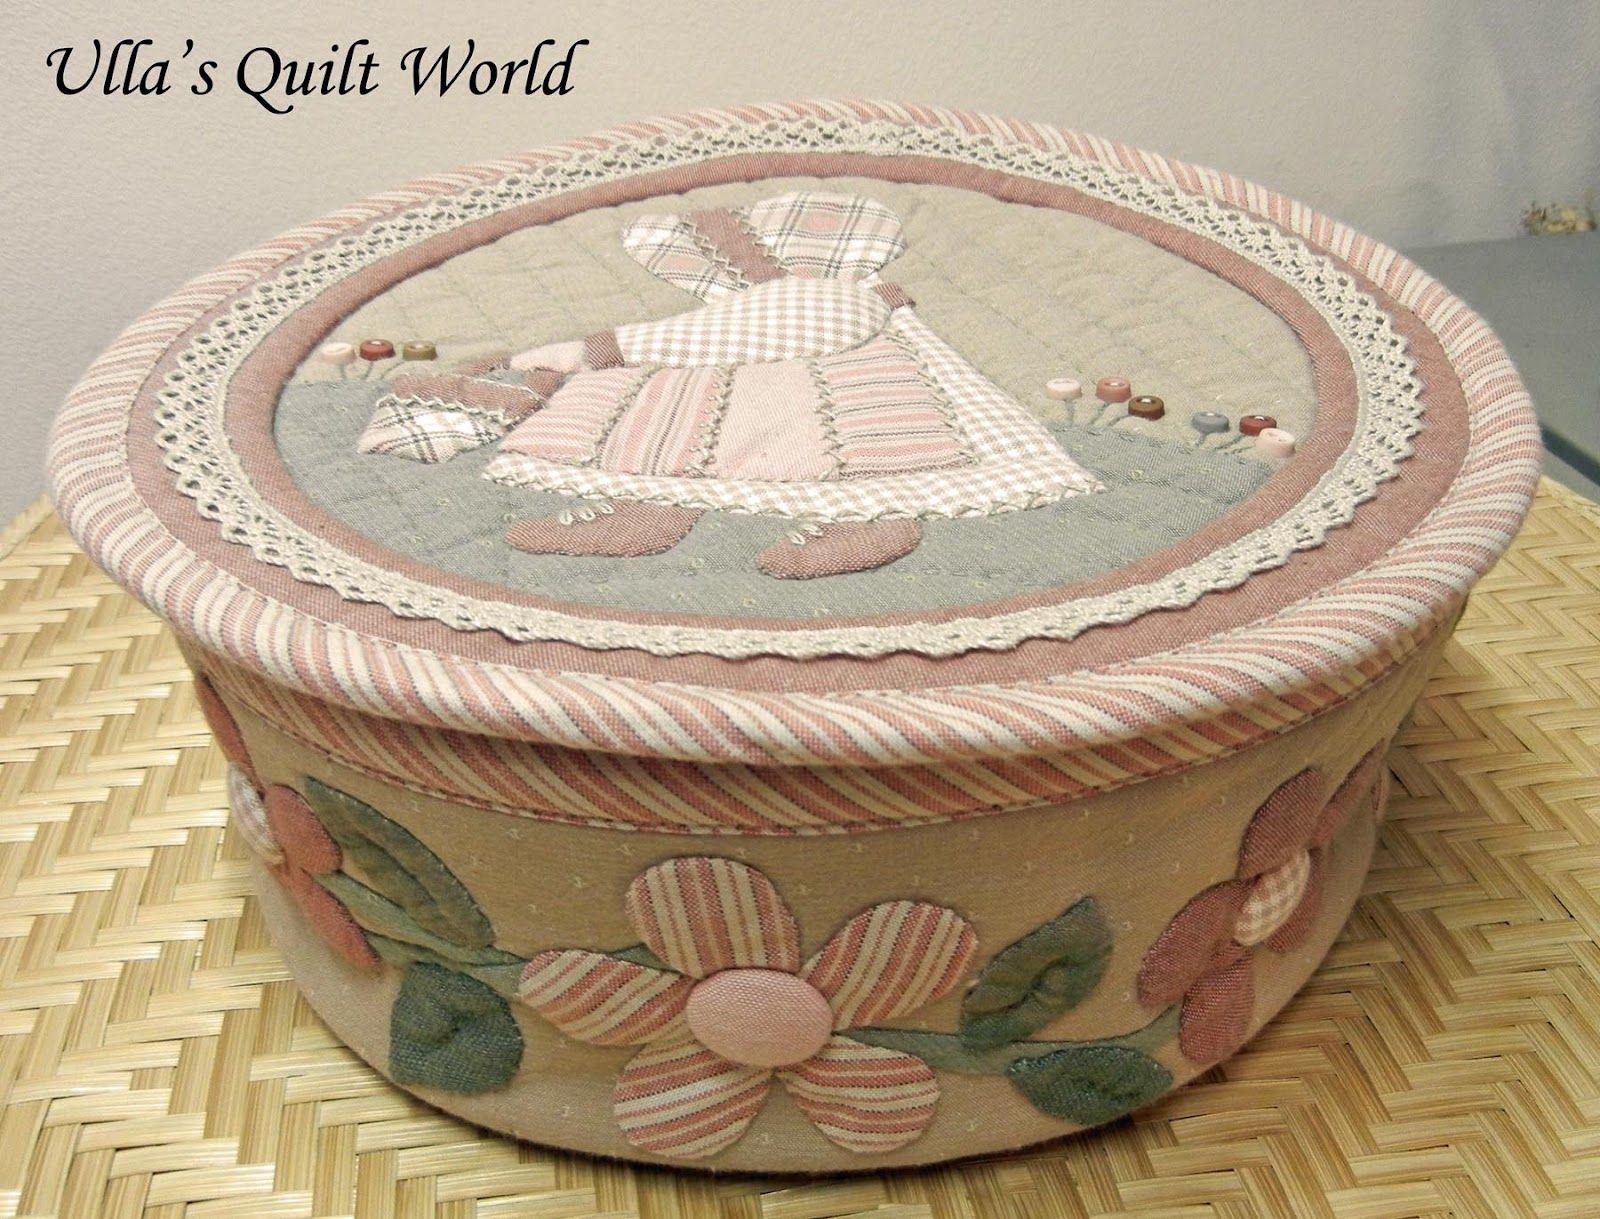 Ulla's Quilt World: Sue Bonnet quilt - Small box